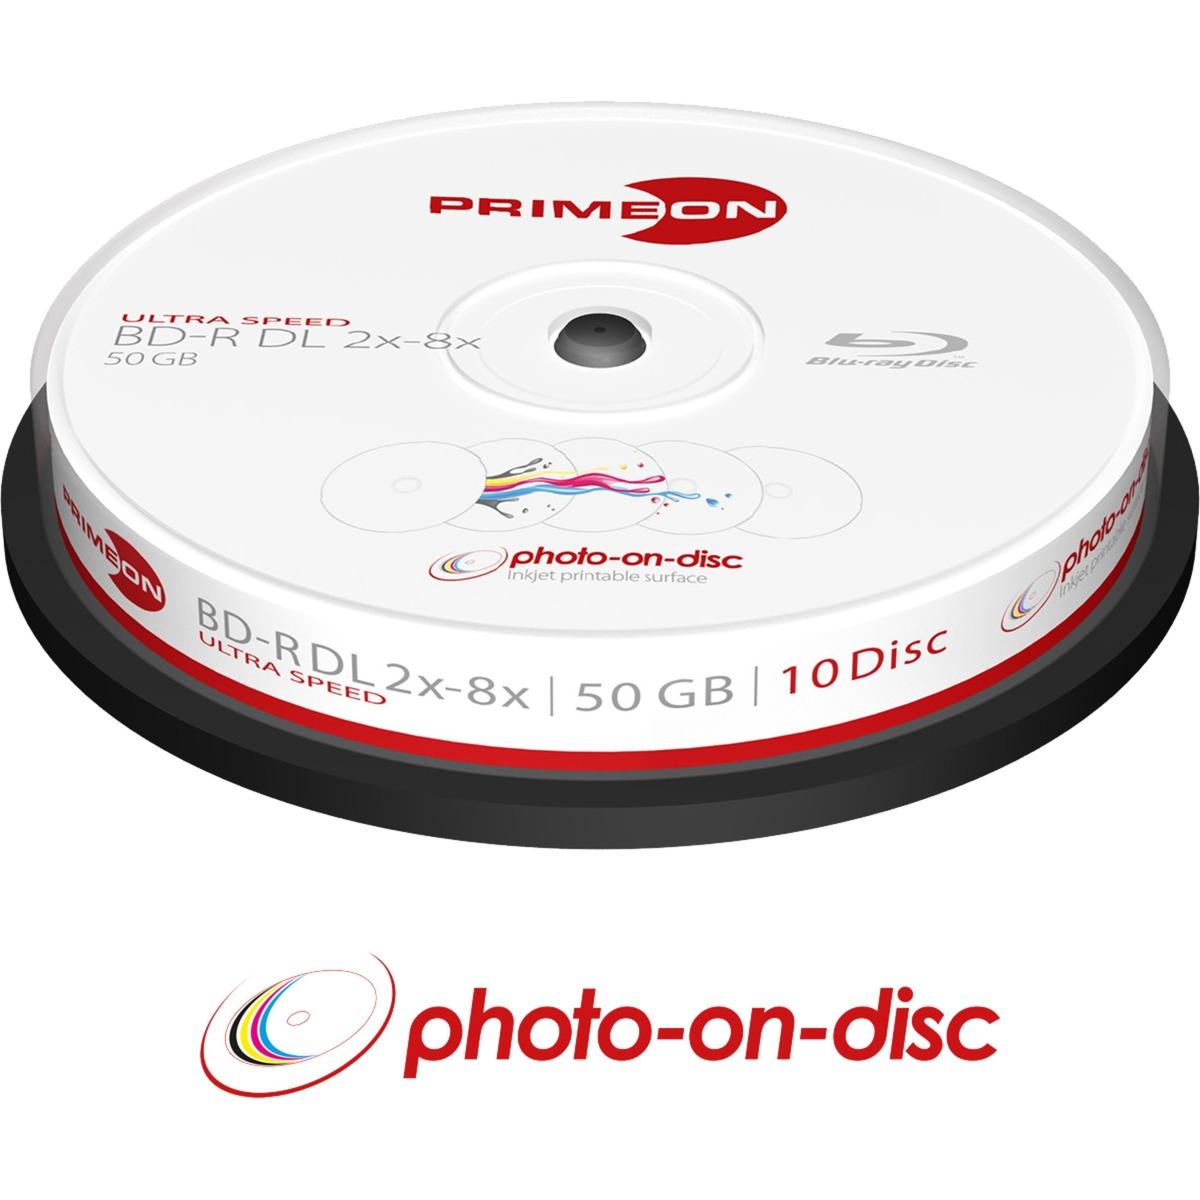 2761312 disco blu-ray lectura/escritura (BD) BD-R DL 50 GB -, 10, Discos Blu-ray vírgenes